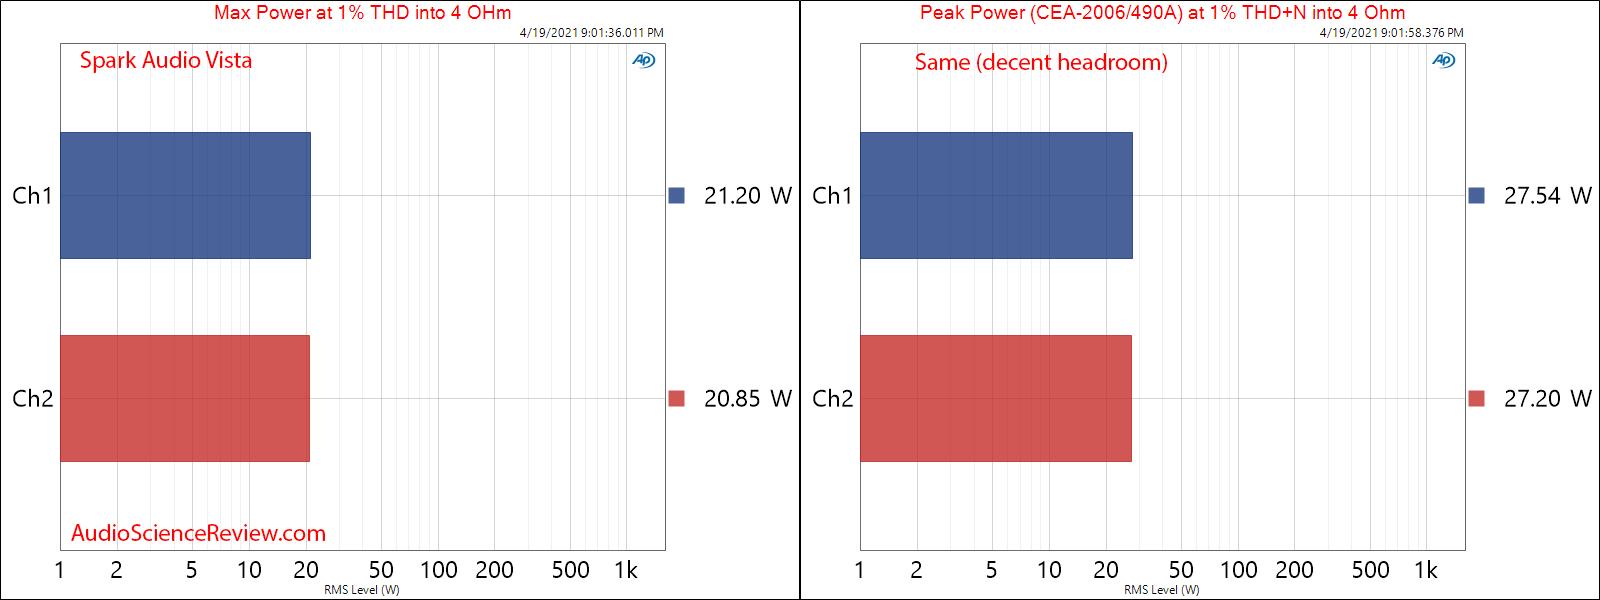 Vista Audio Spark Max and Peak Power into 4 ohm Measurements.png